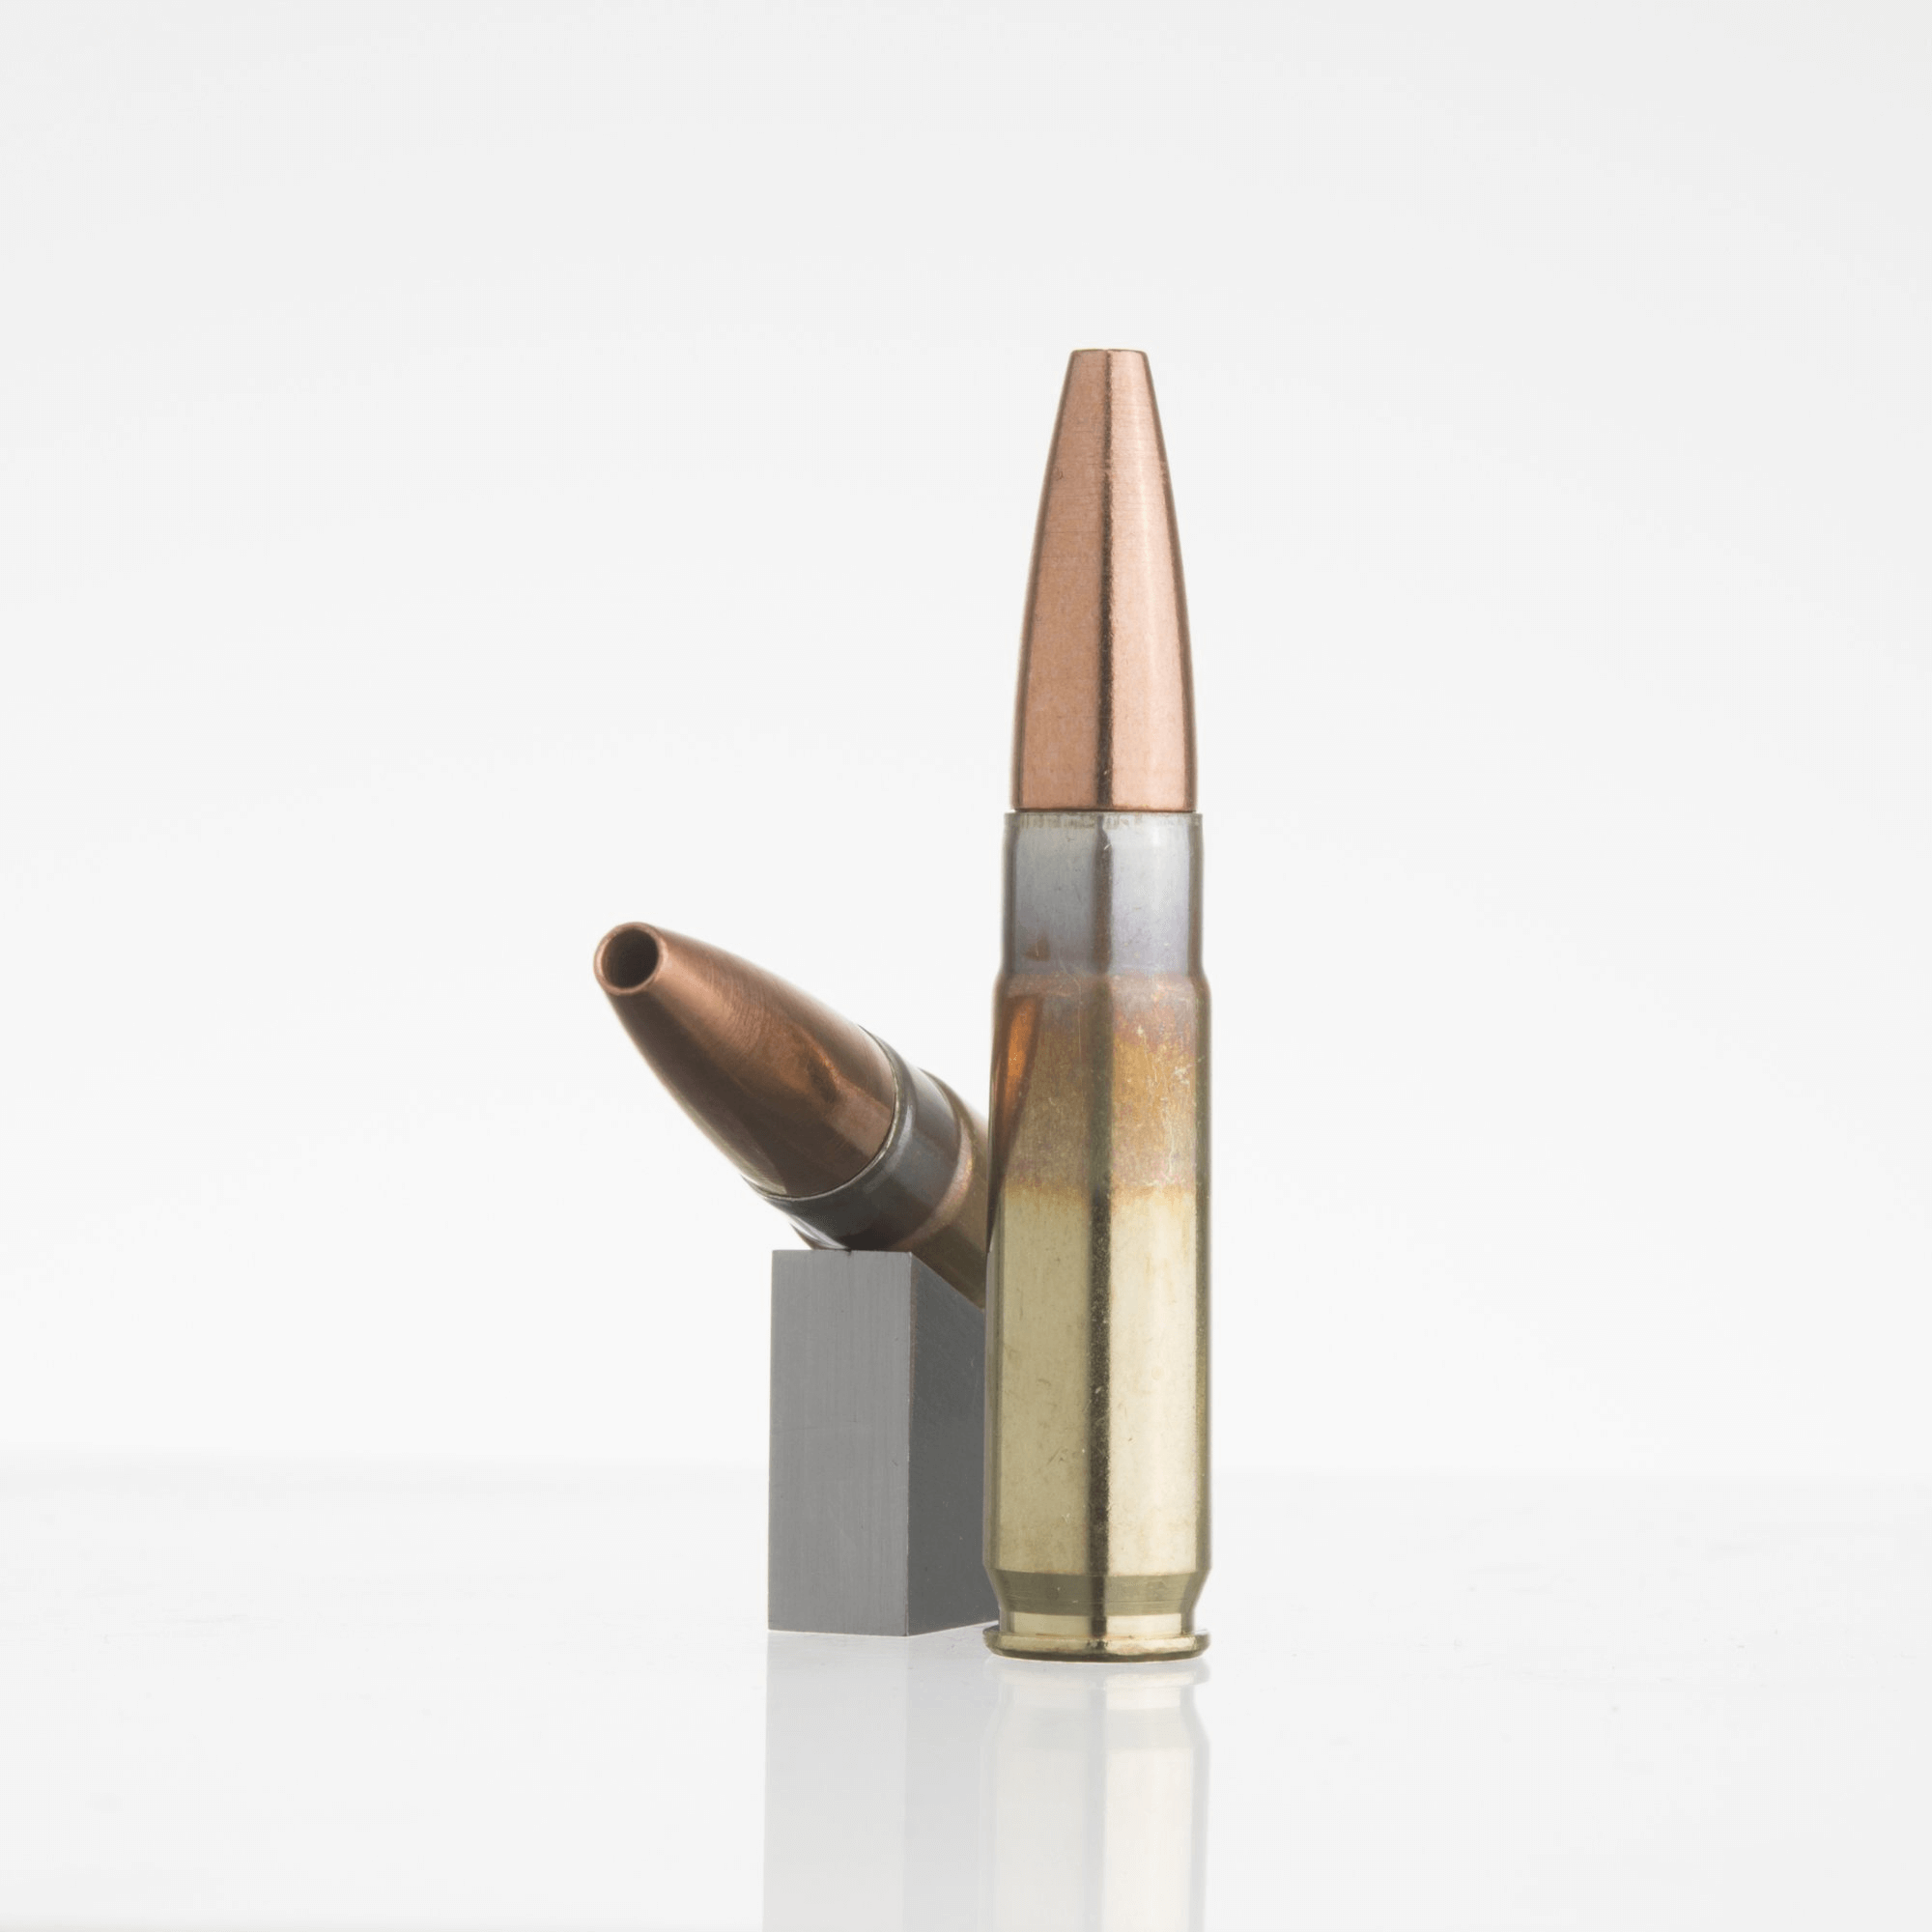 300 Blackout Ballistics: 300 AAC Blackout / Whisper 115gr High Velocity Controlled